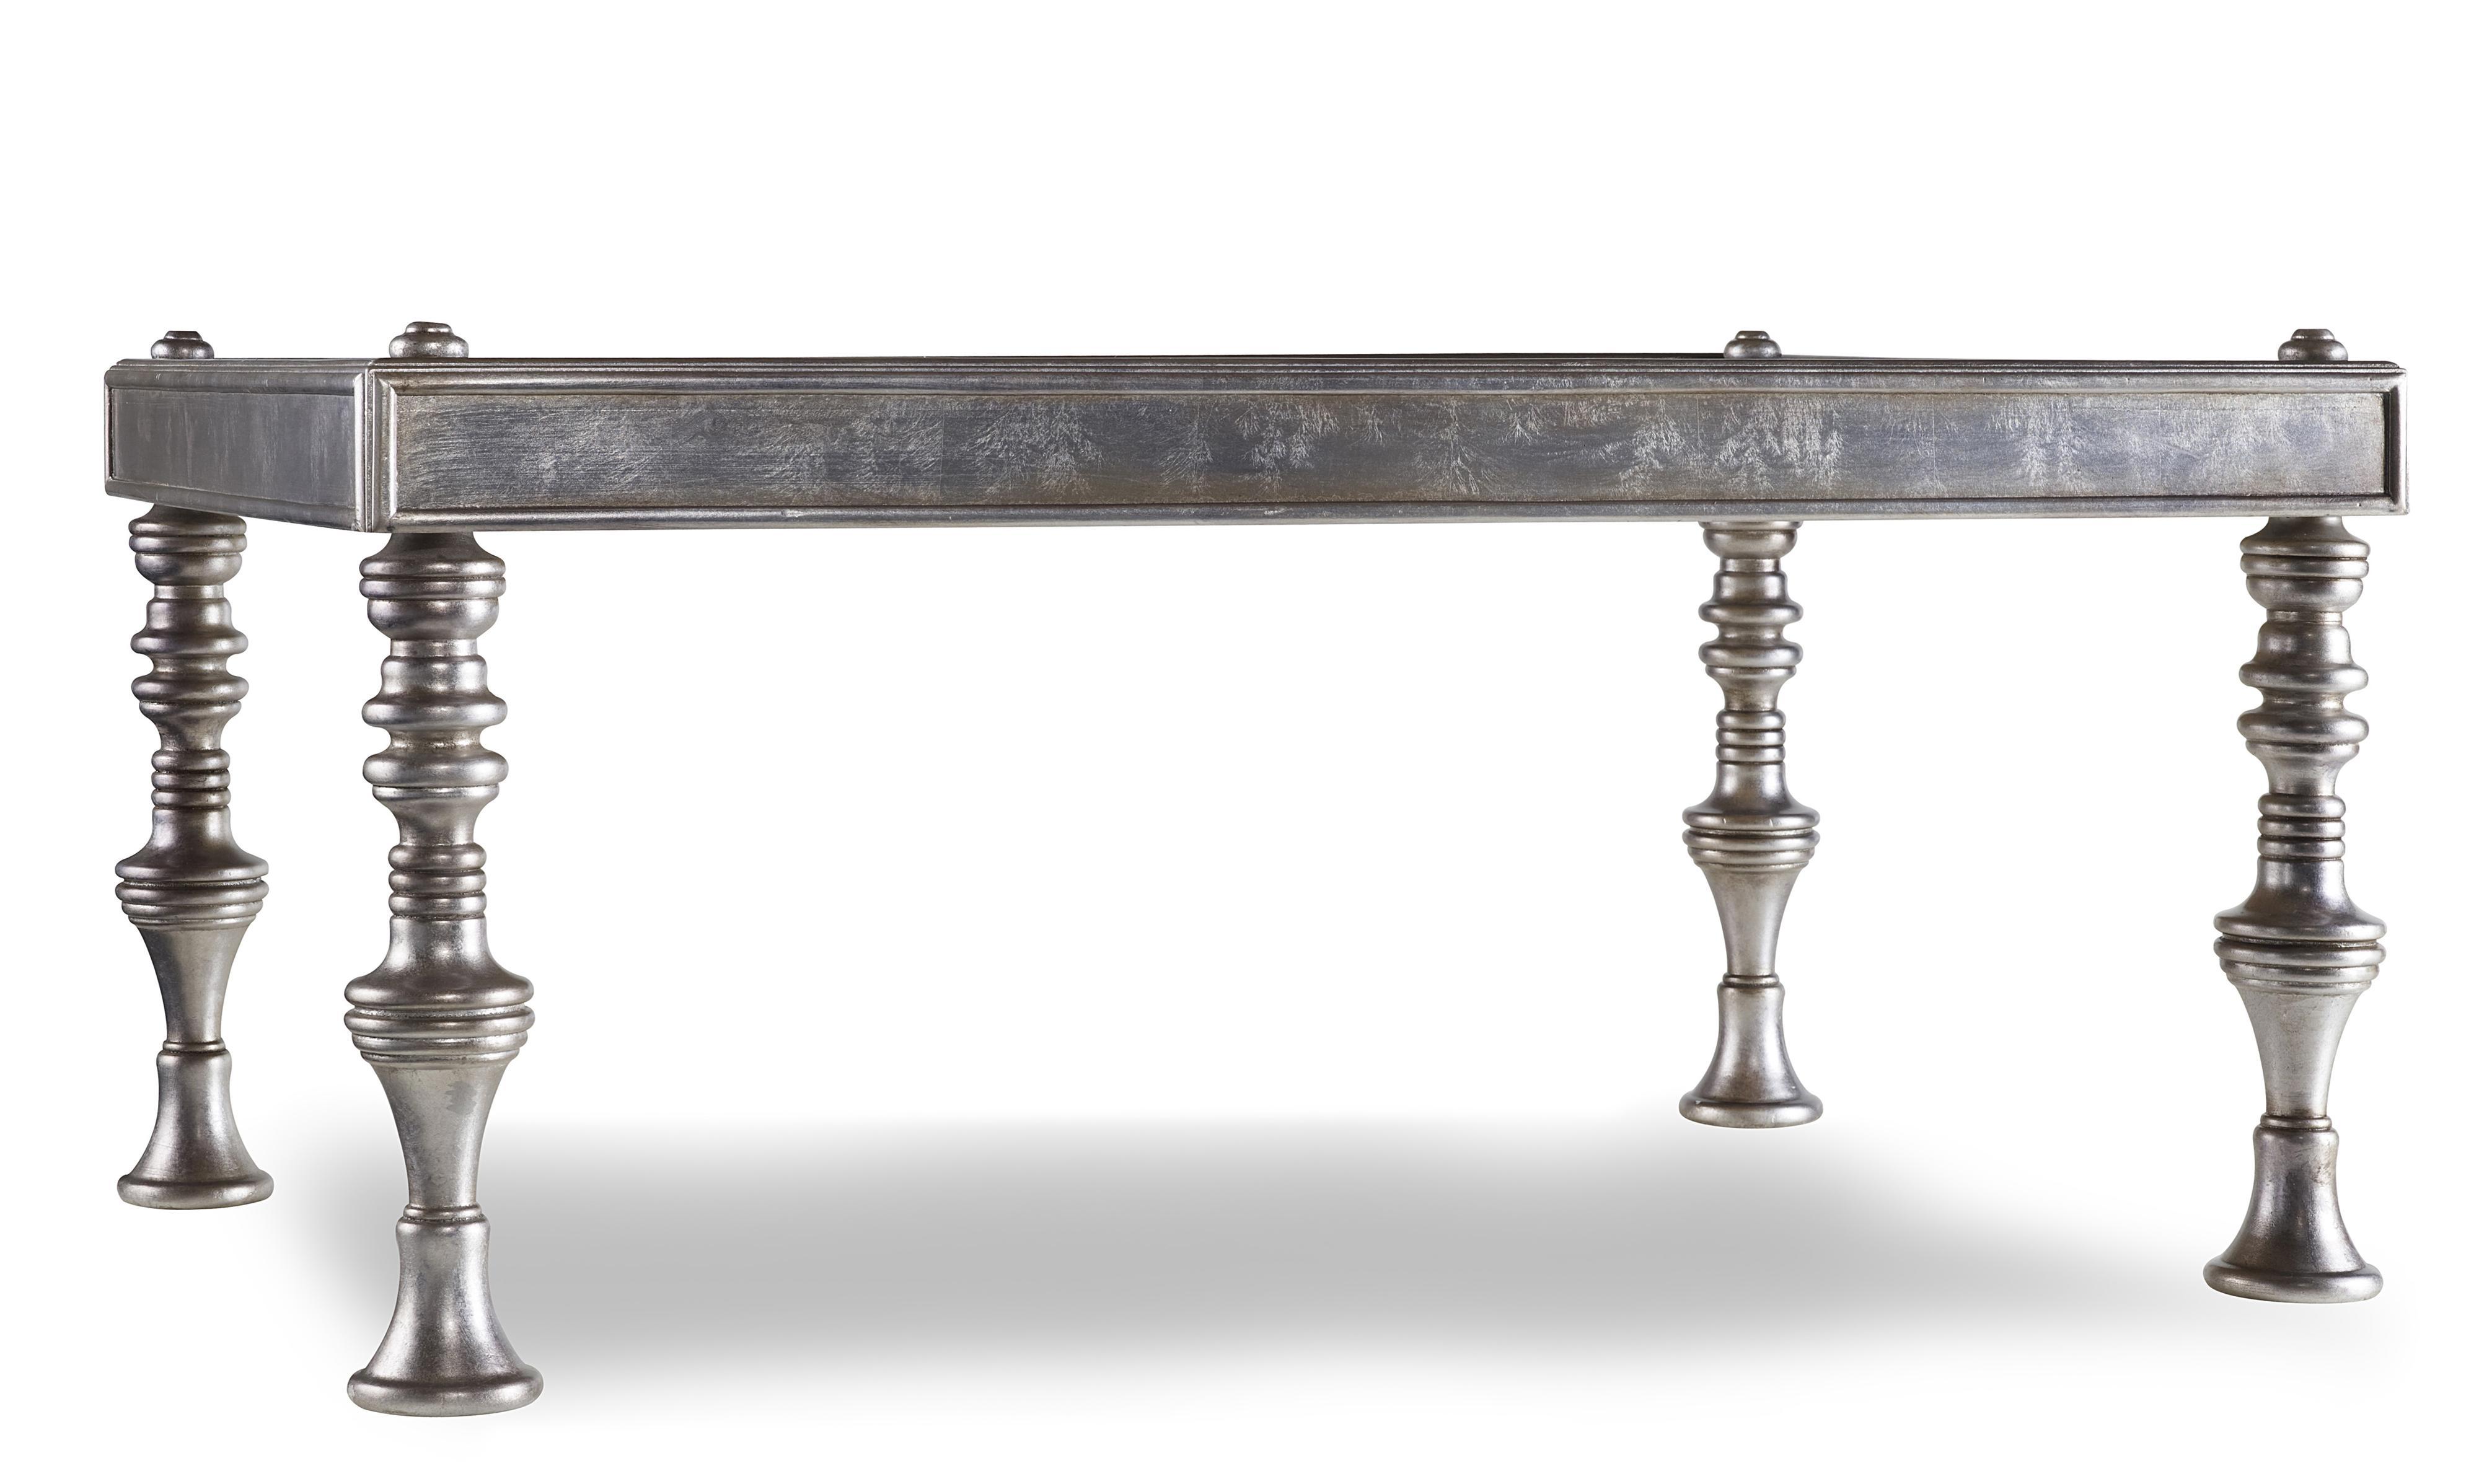 Zinc Finish Furniture Hooker Furniture Mclange Sebastian Cocktail Table With Iridescent